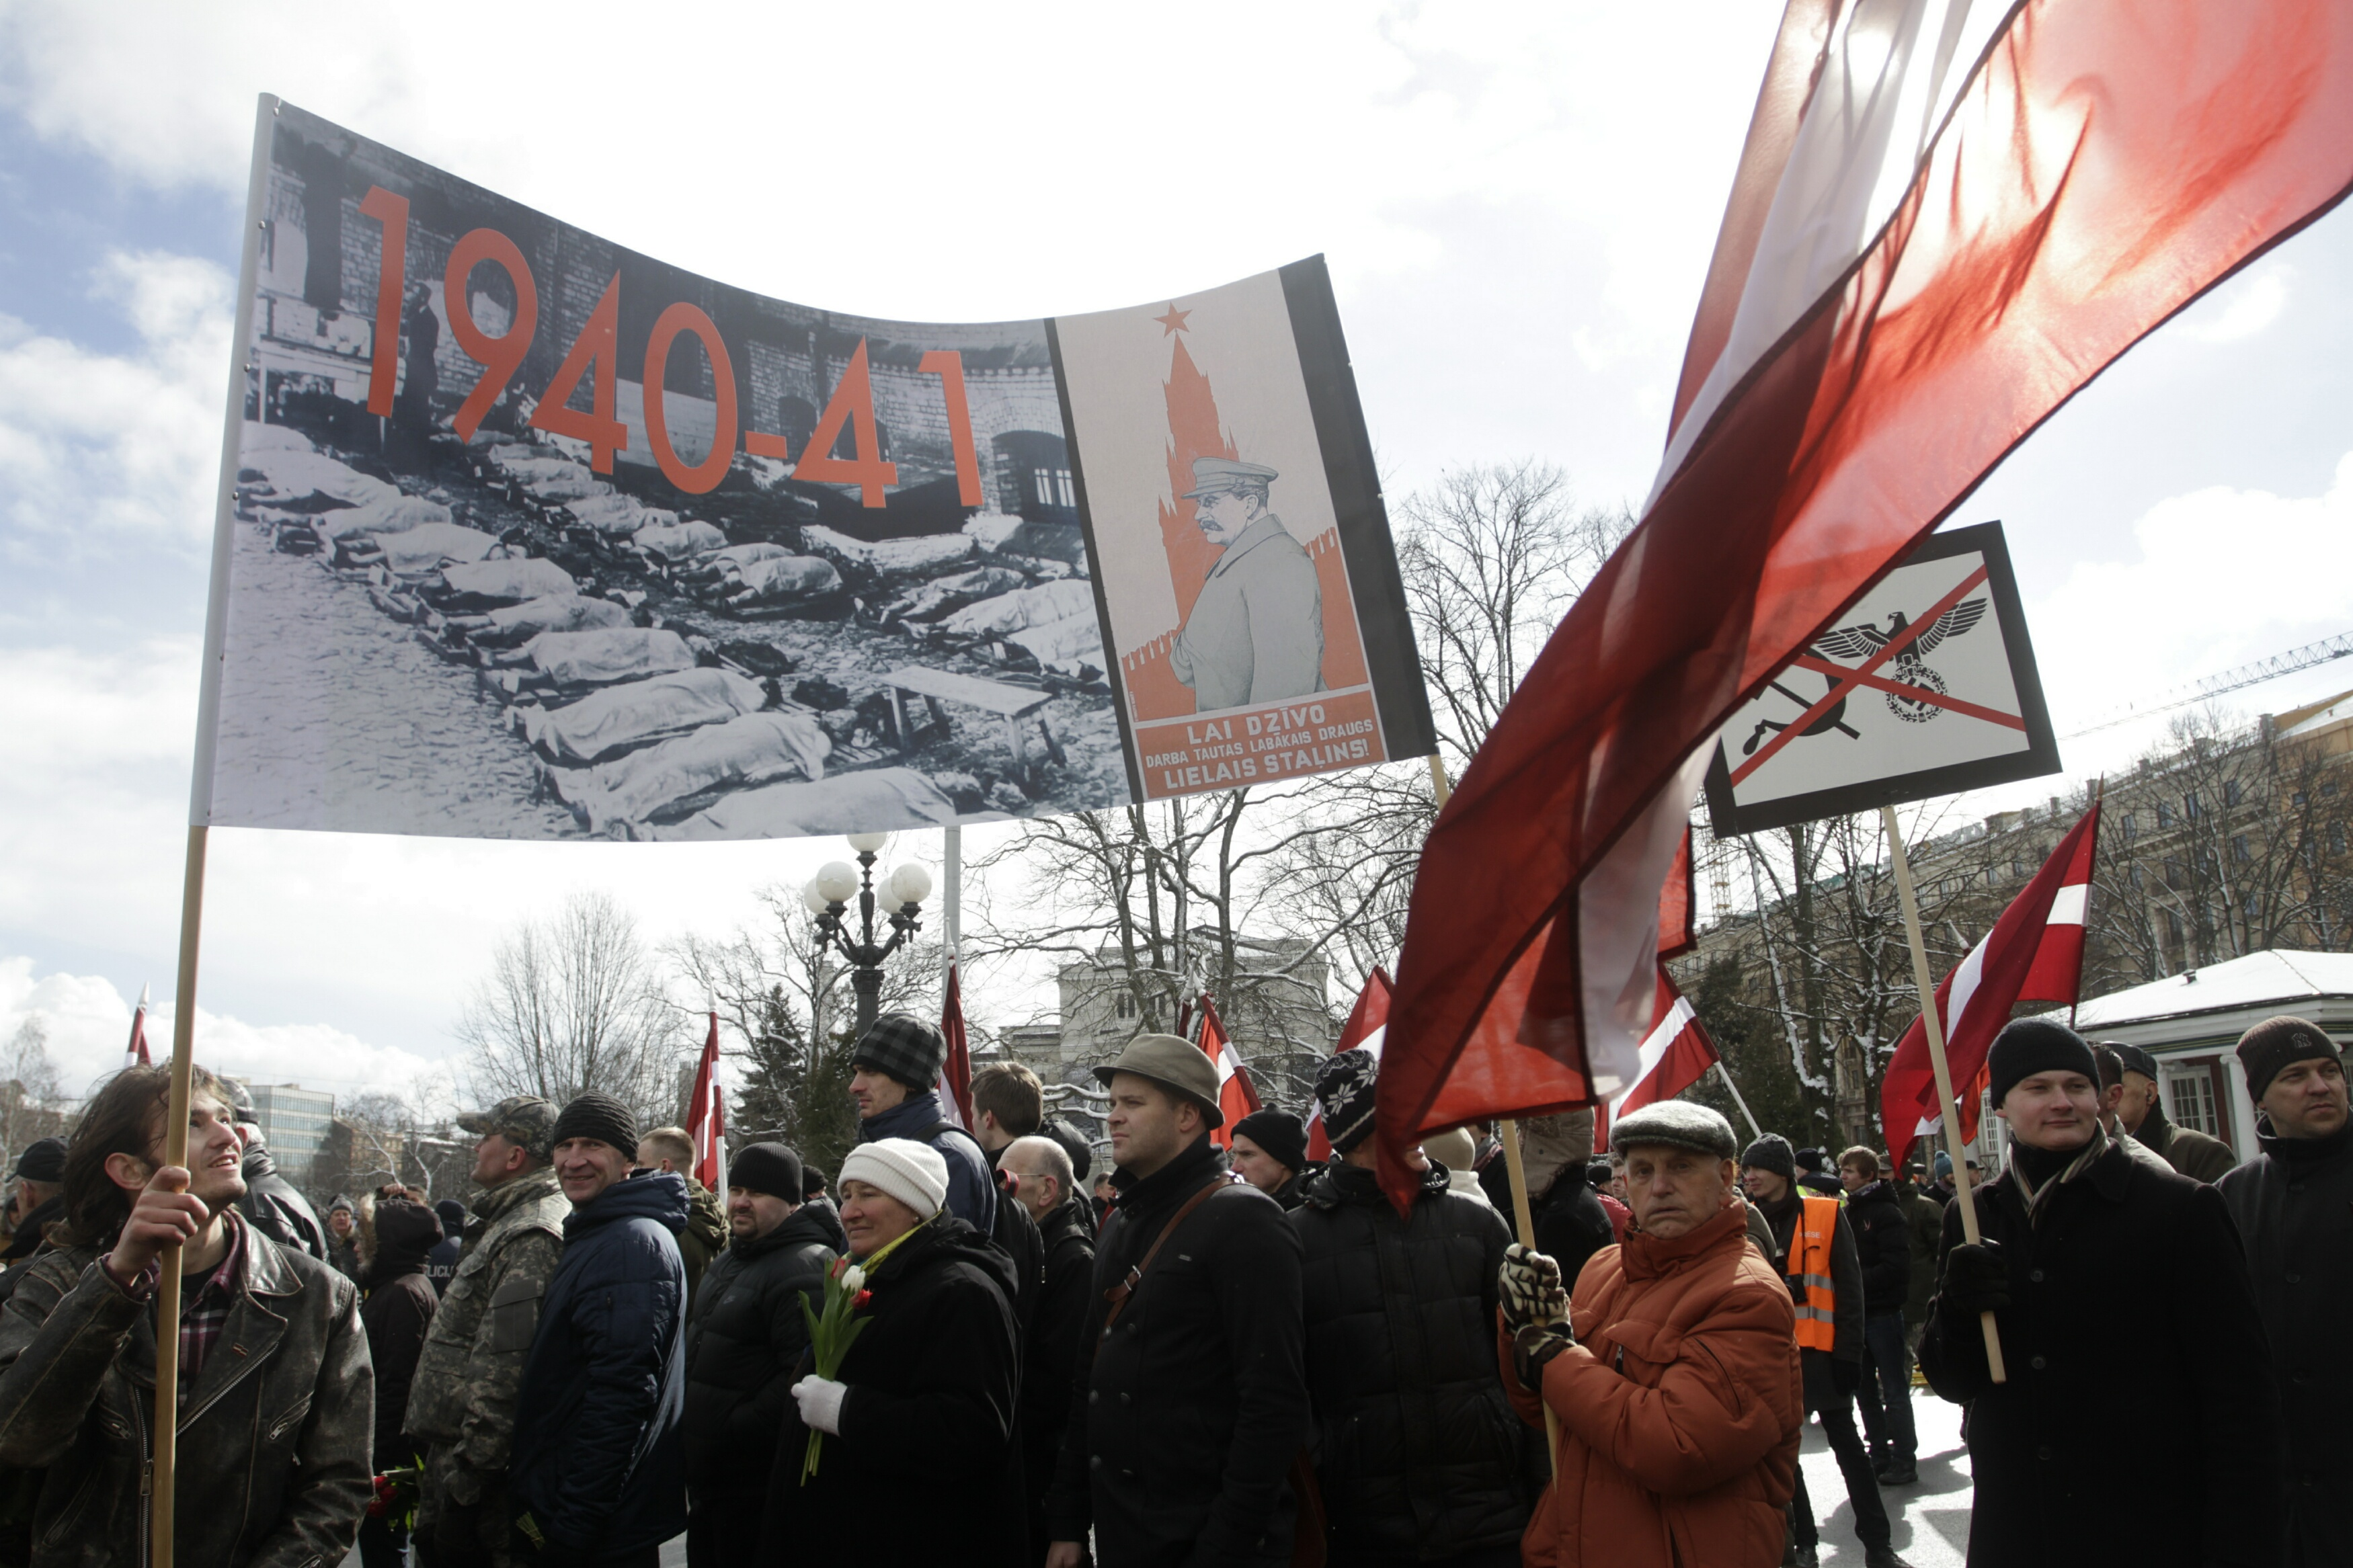 Riga, Lavia - Latvians Honor Nazi Allies From WWII